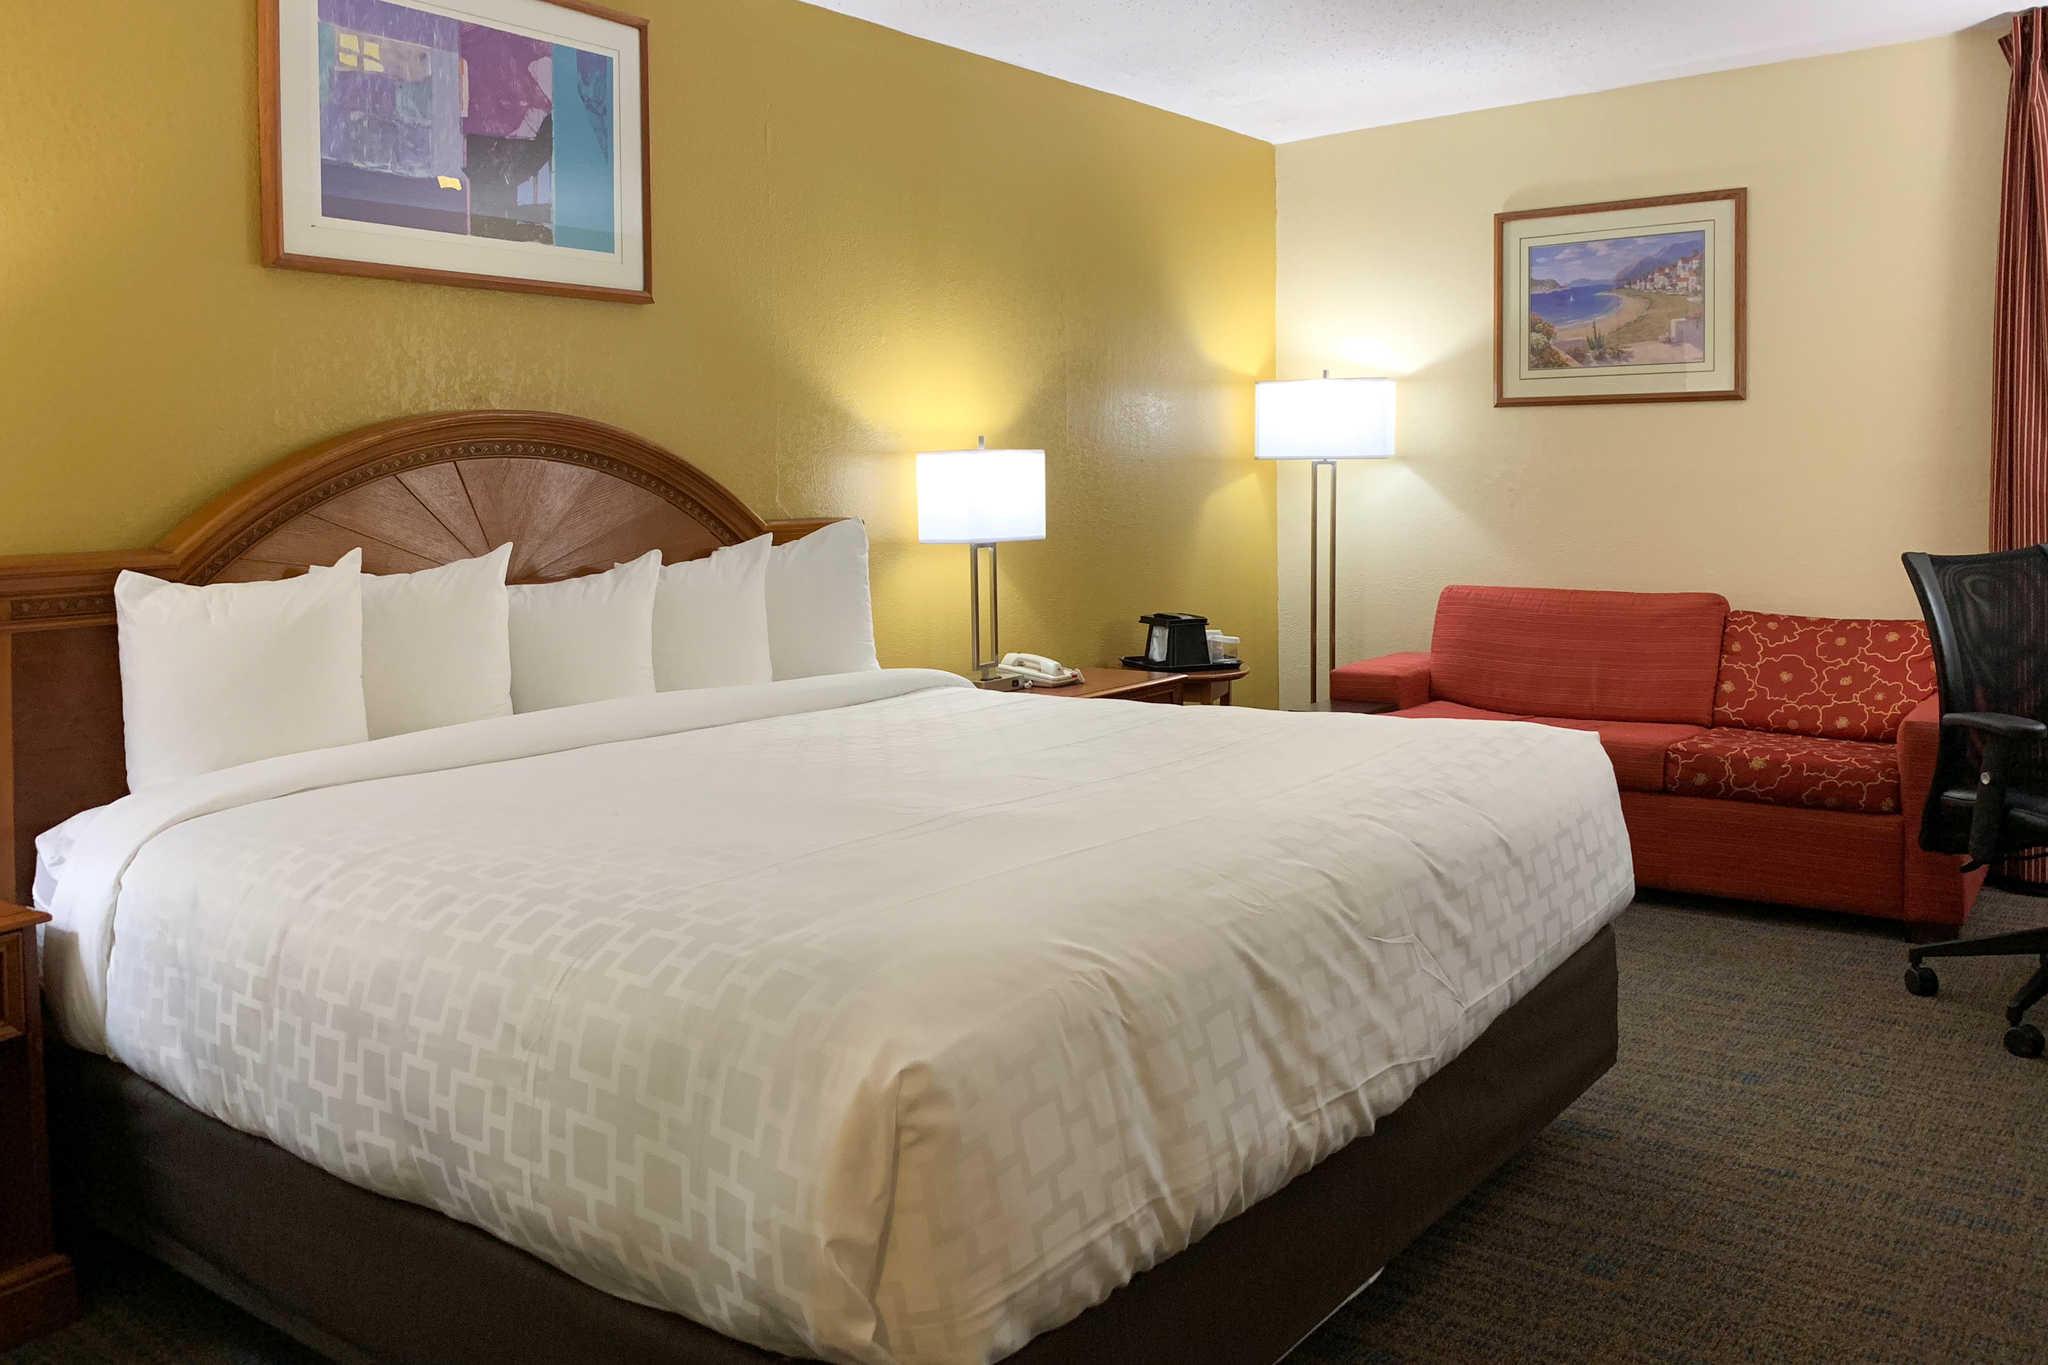 Clarion Inn image 0